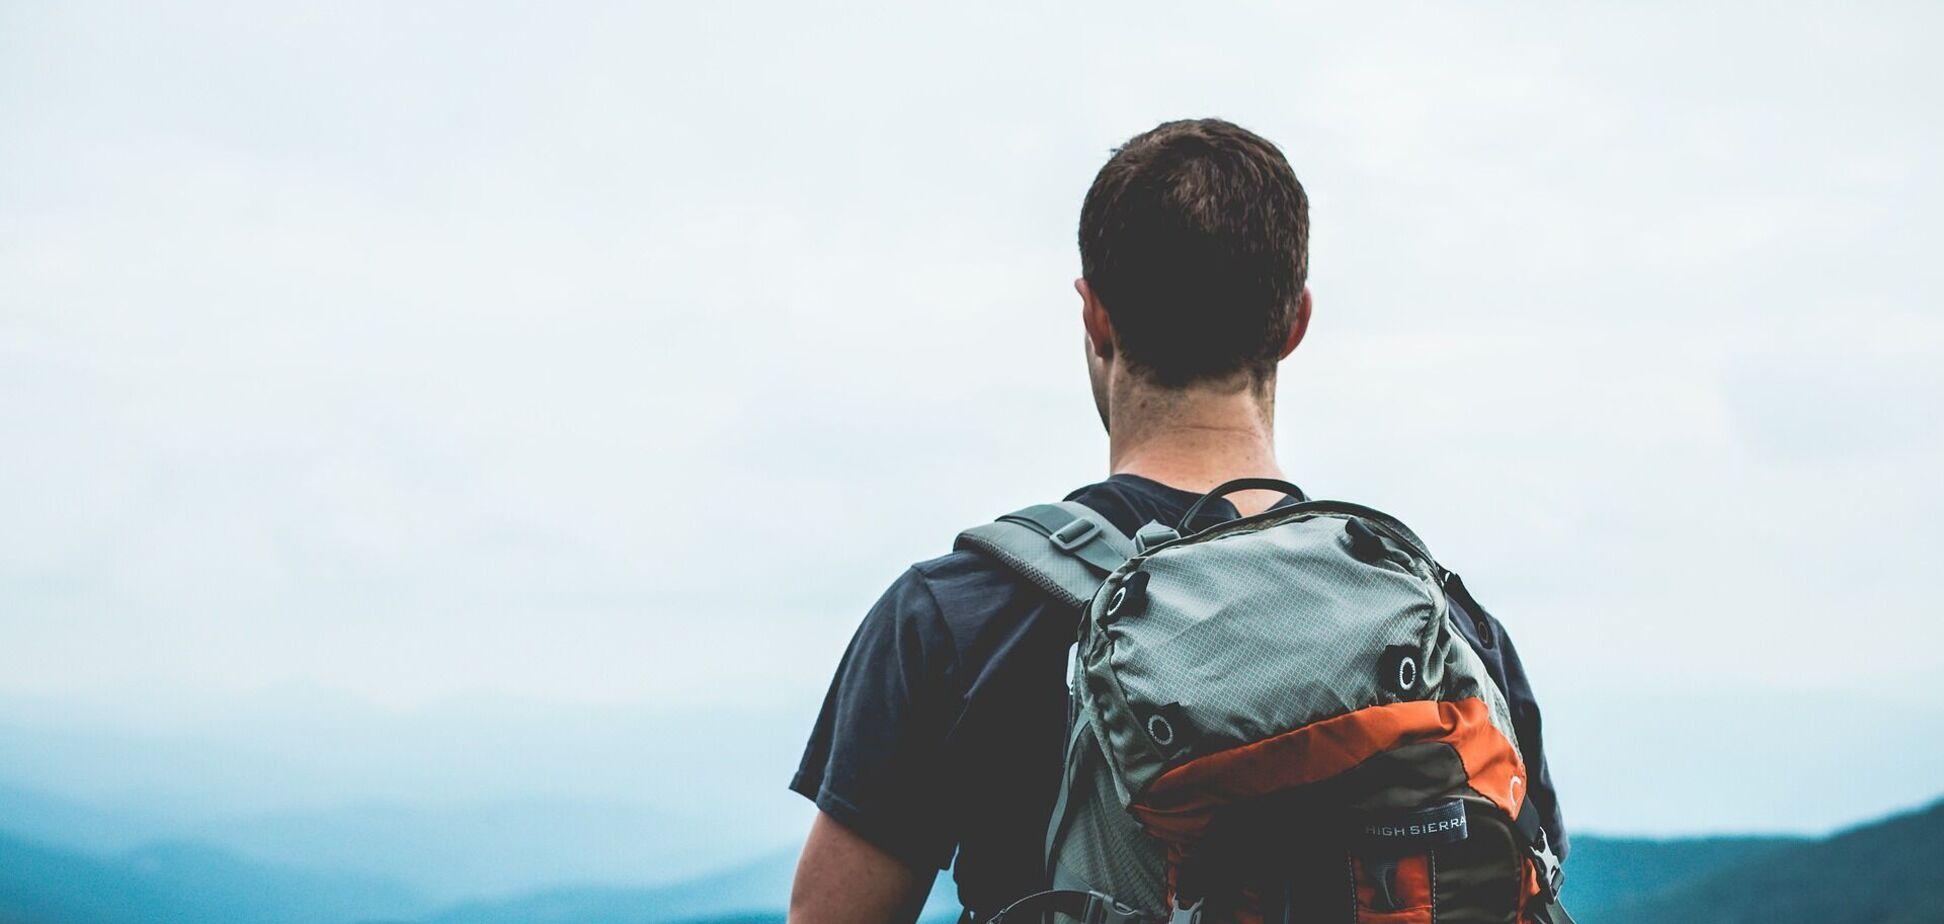 Українець пройшов понад тисячу км пішки